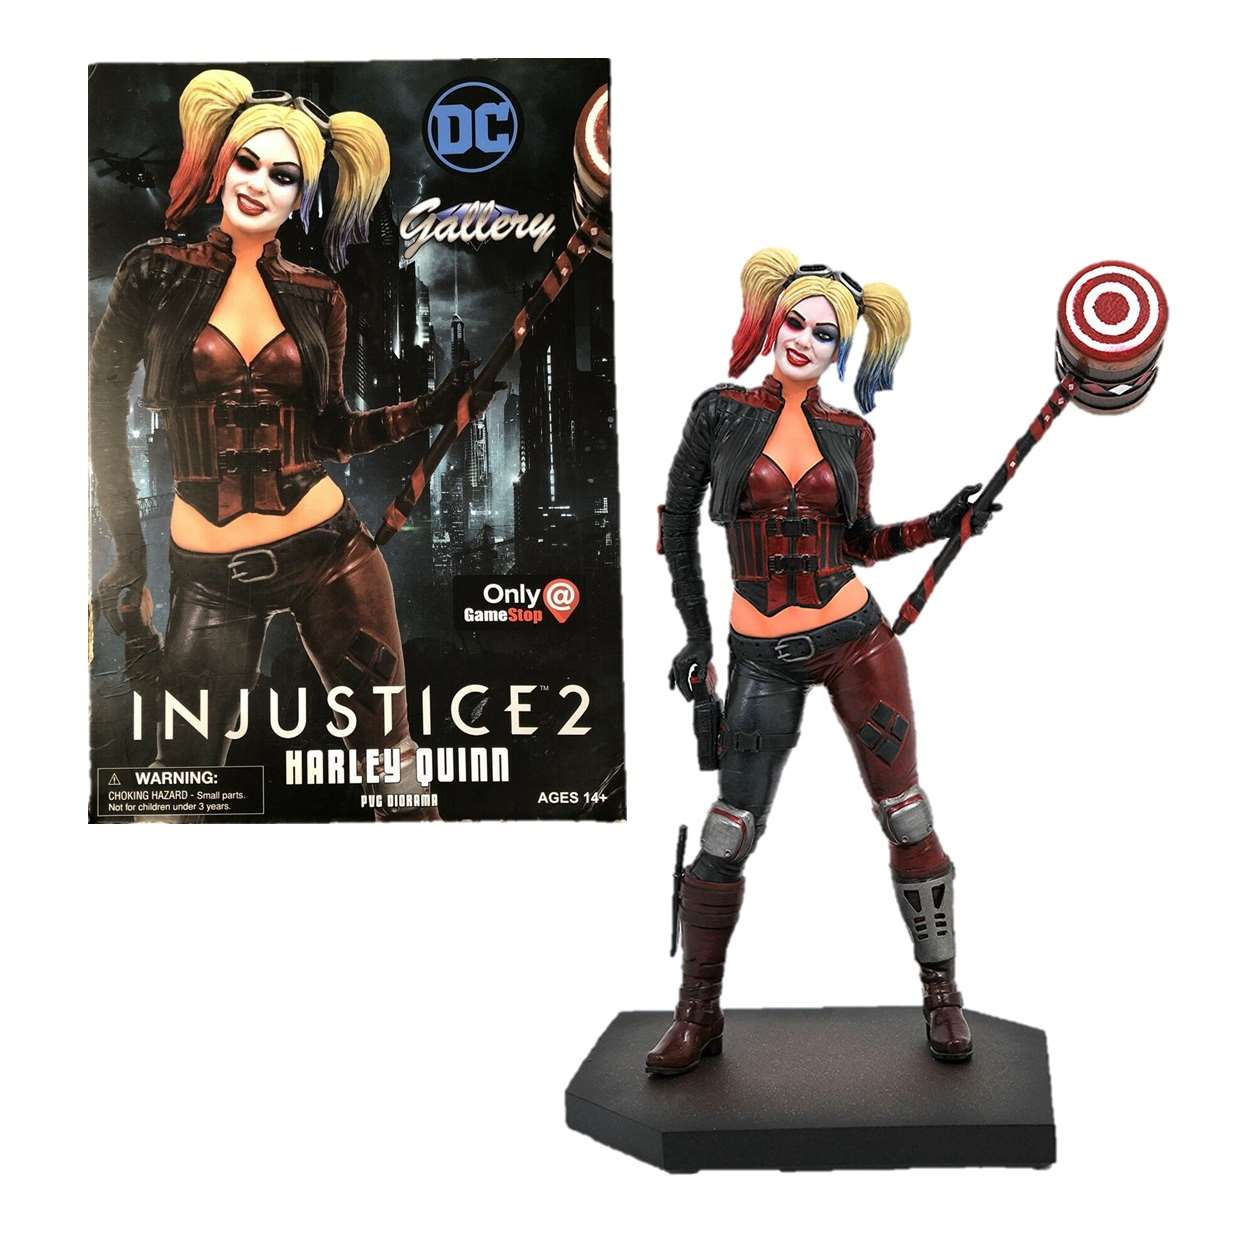 Diorama Harley Quinn Figura Injustice 2 Gallery Gamestop